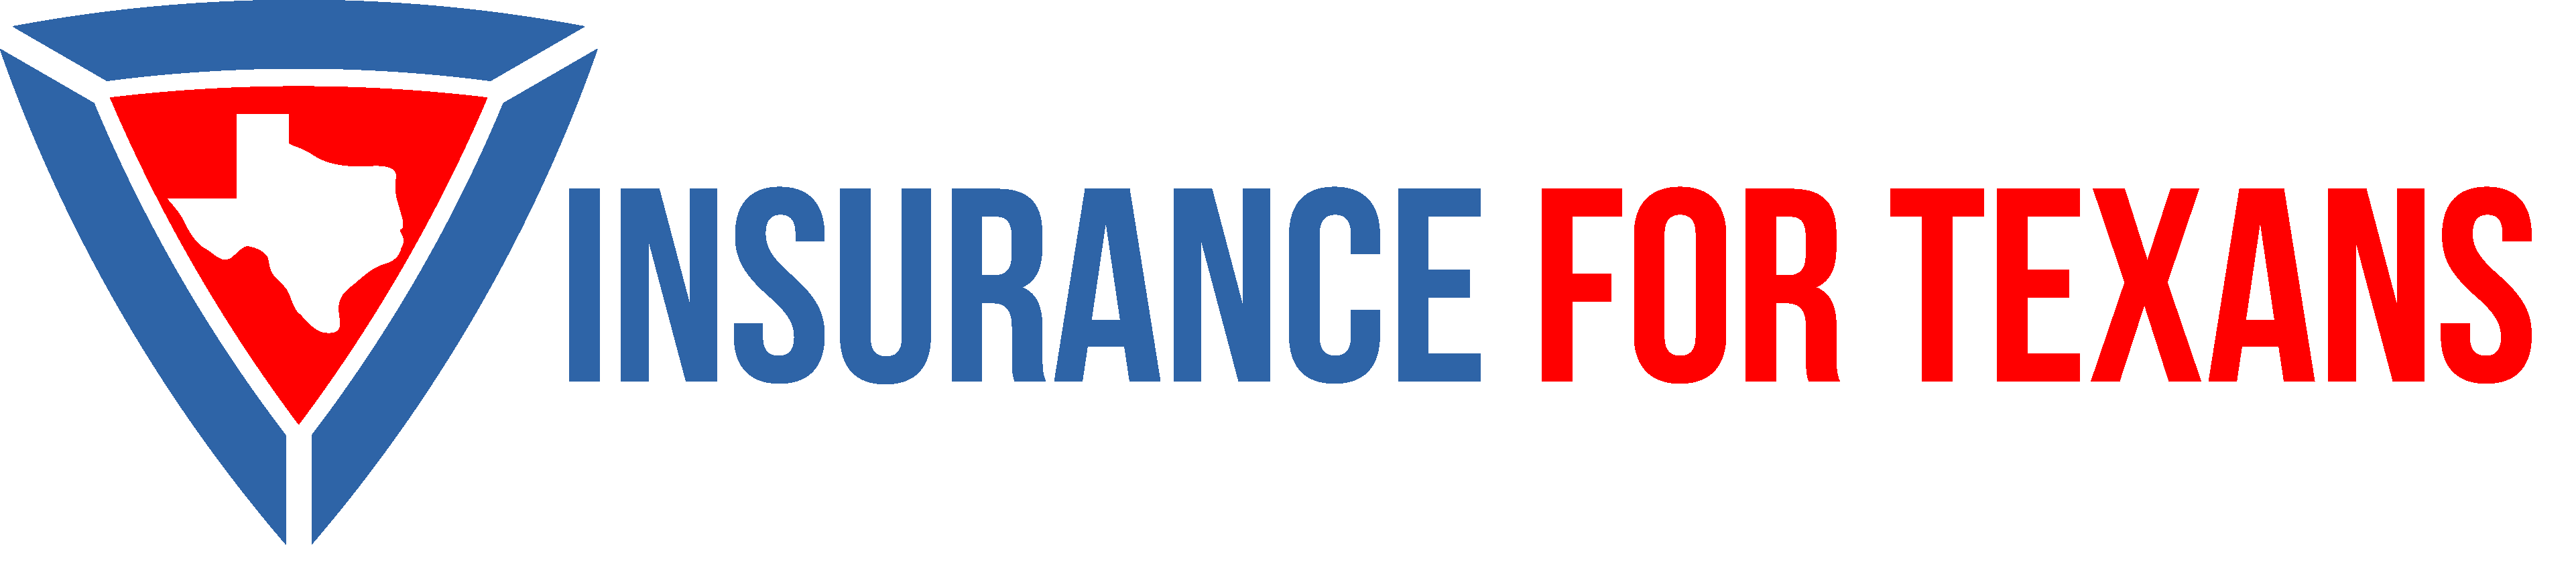 Insurance For Texans